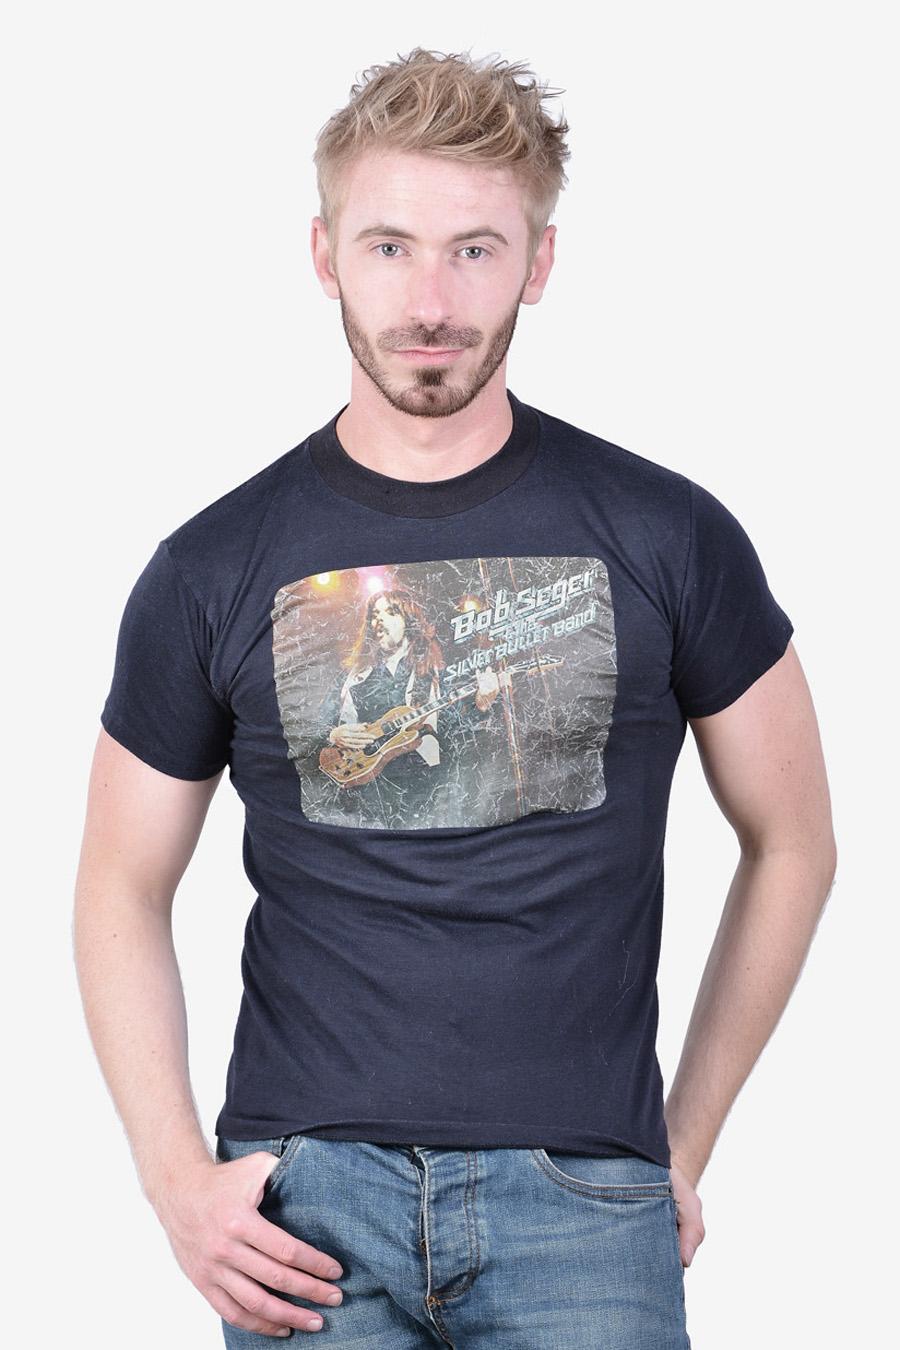 Vintage Bob Seger & The Silver Bullet Band t shirt